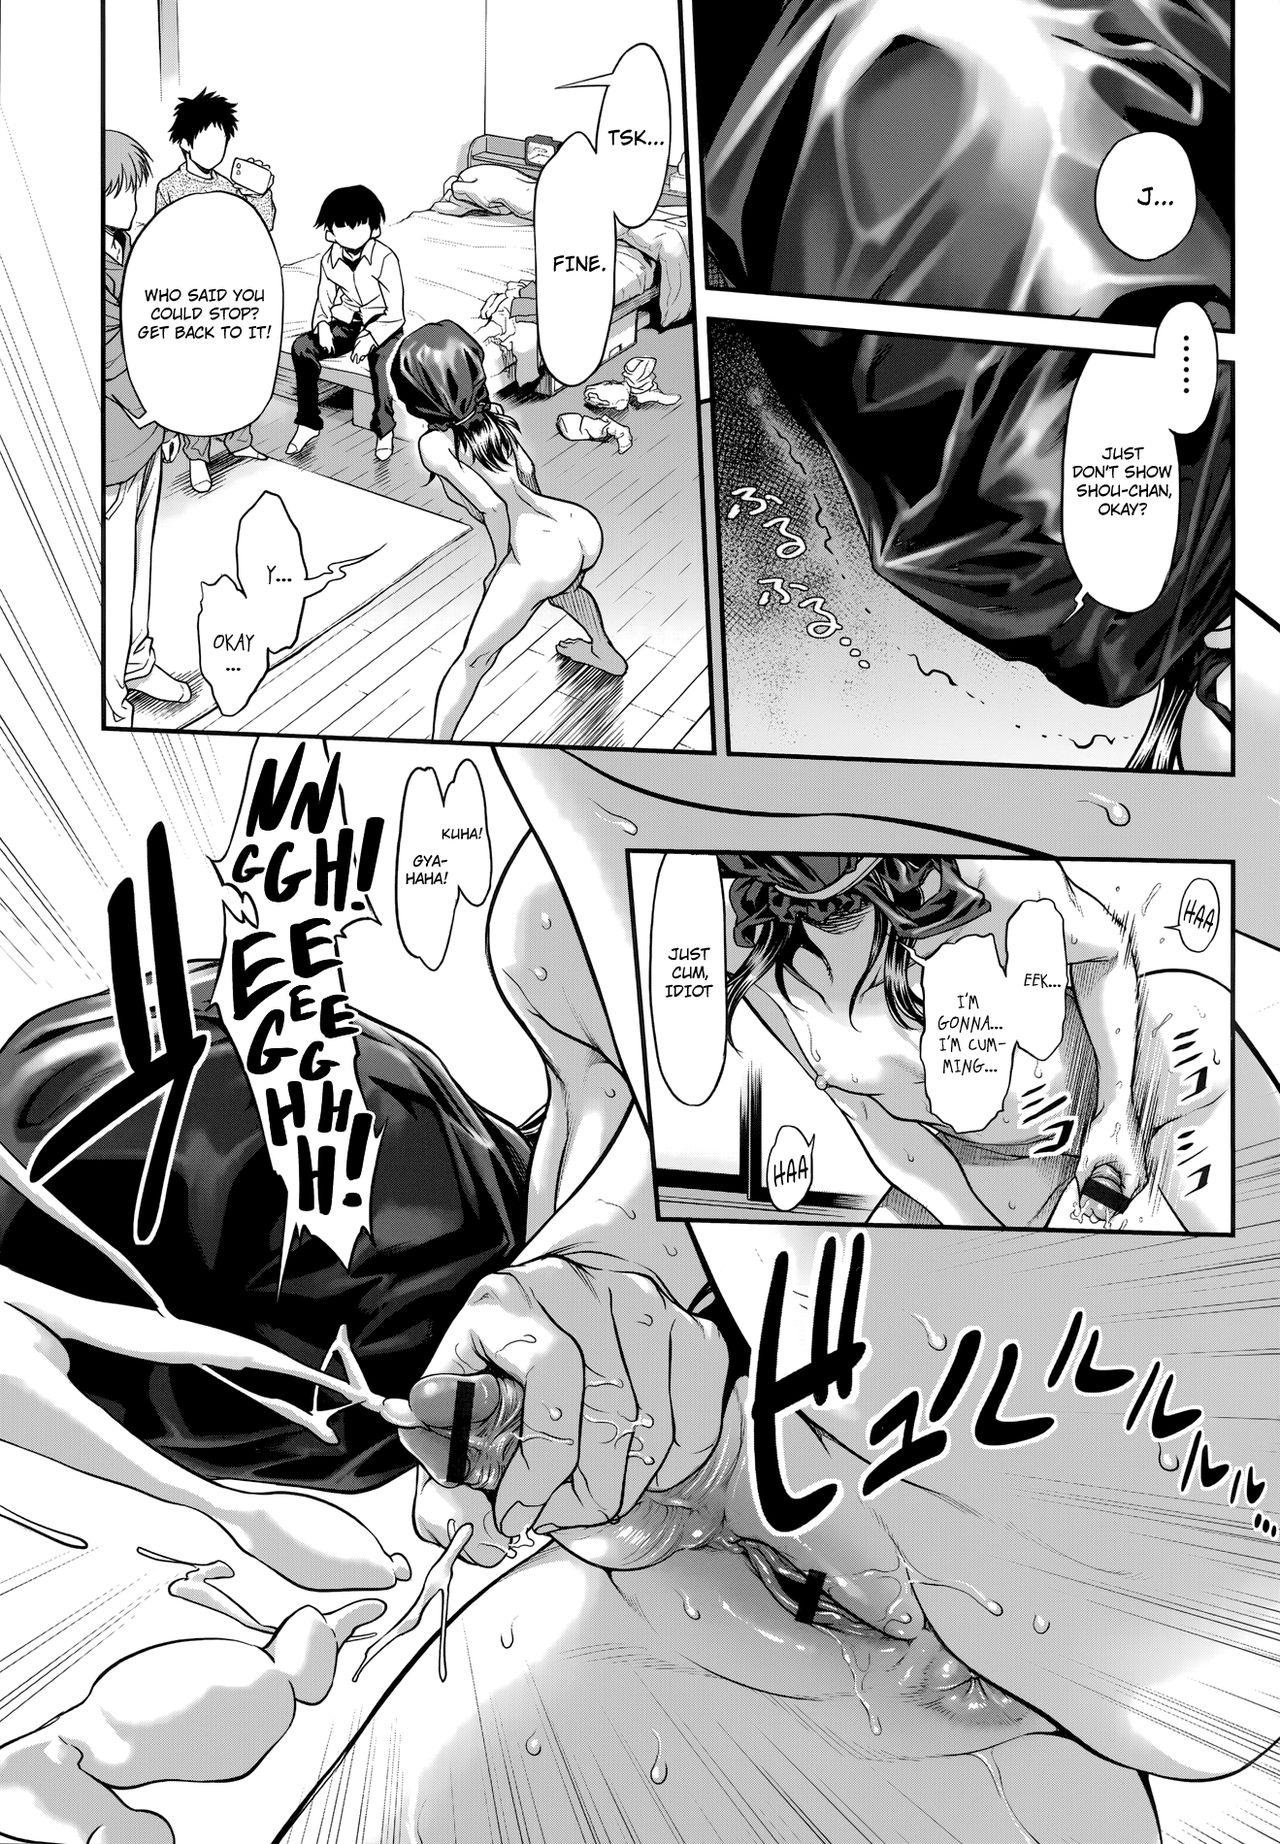 [Sannyuutei Shinta] Chinpotsuki Ijimerarekko | «Dickgirl!», The Bullying Story - Ch. 1-4 [English] [34th squad] 80